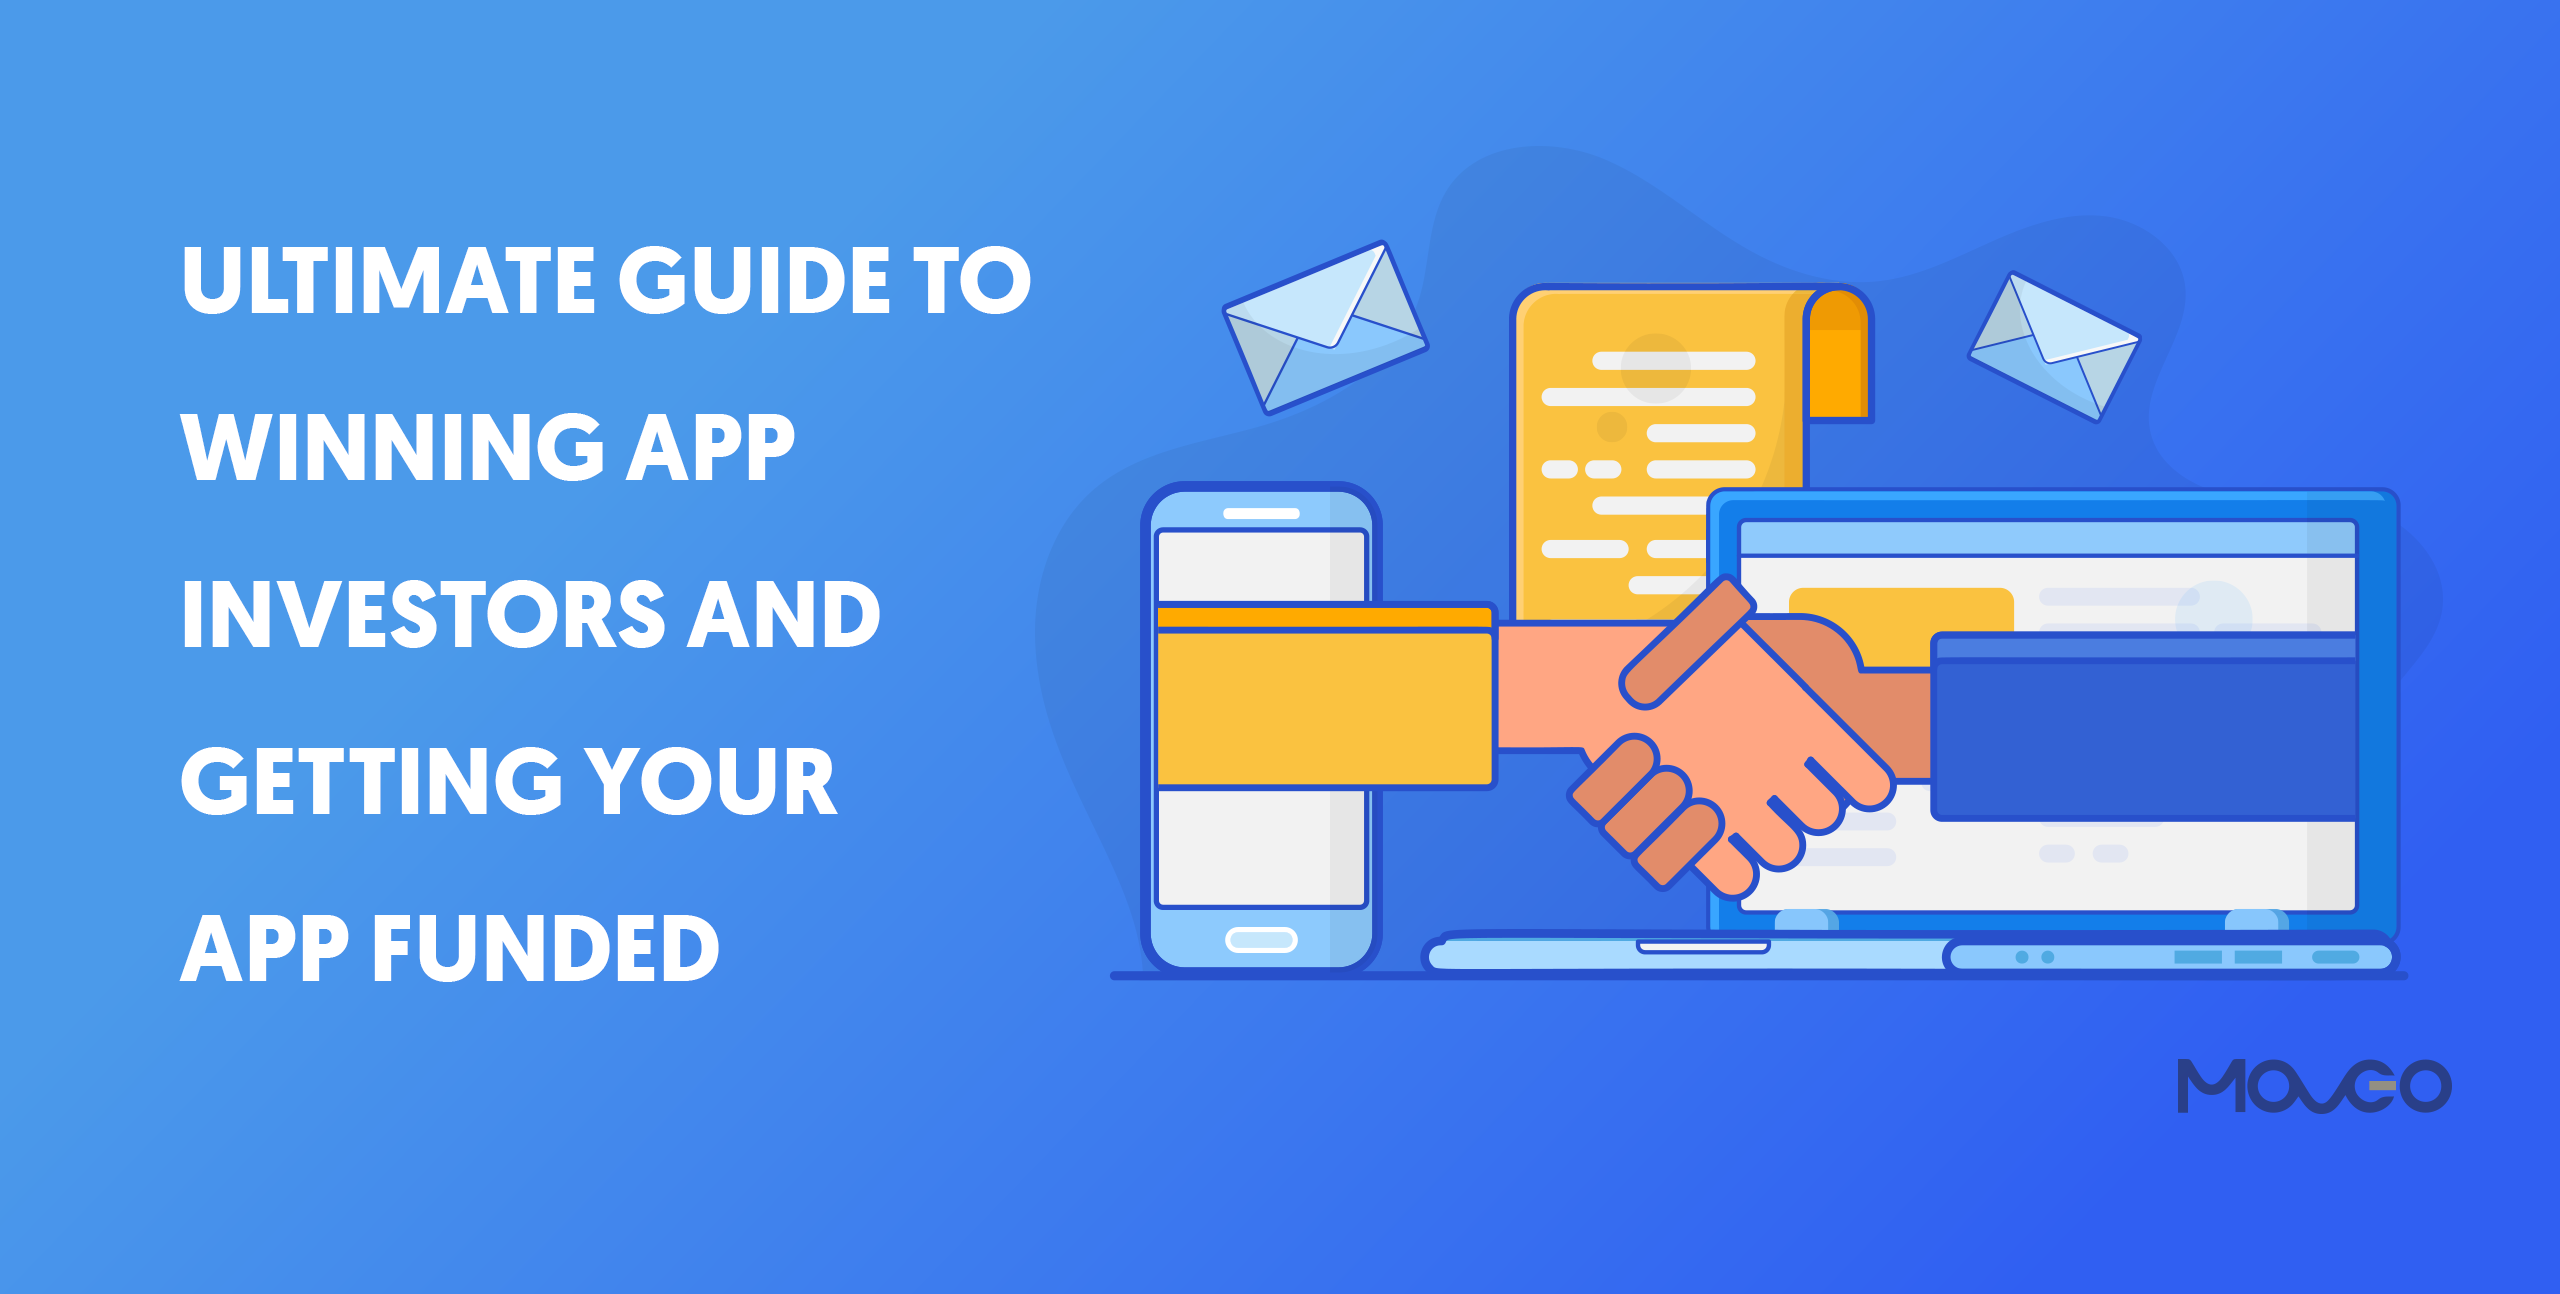 ultimate guide to winning app investors